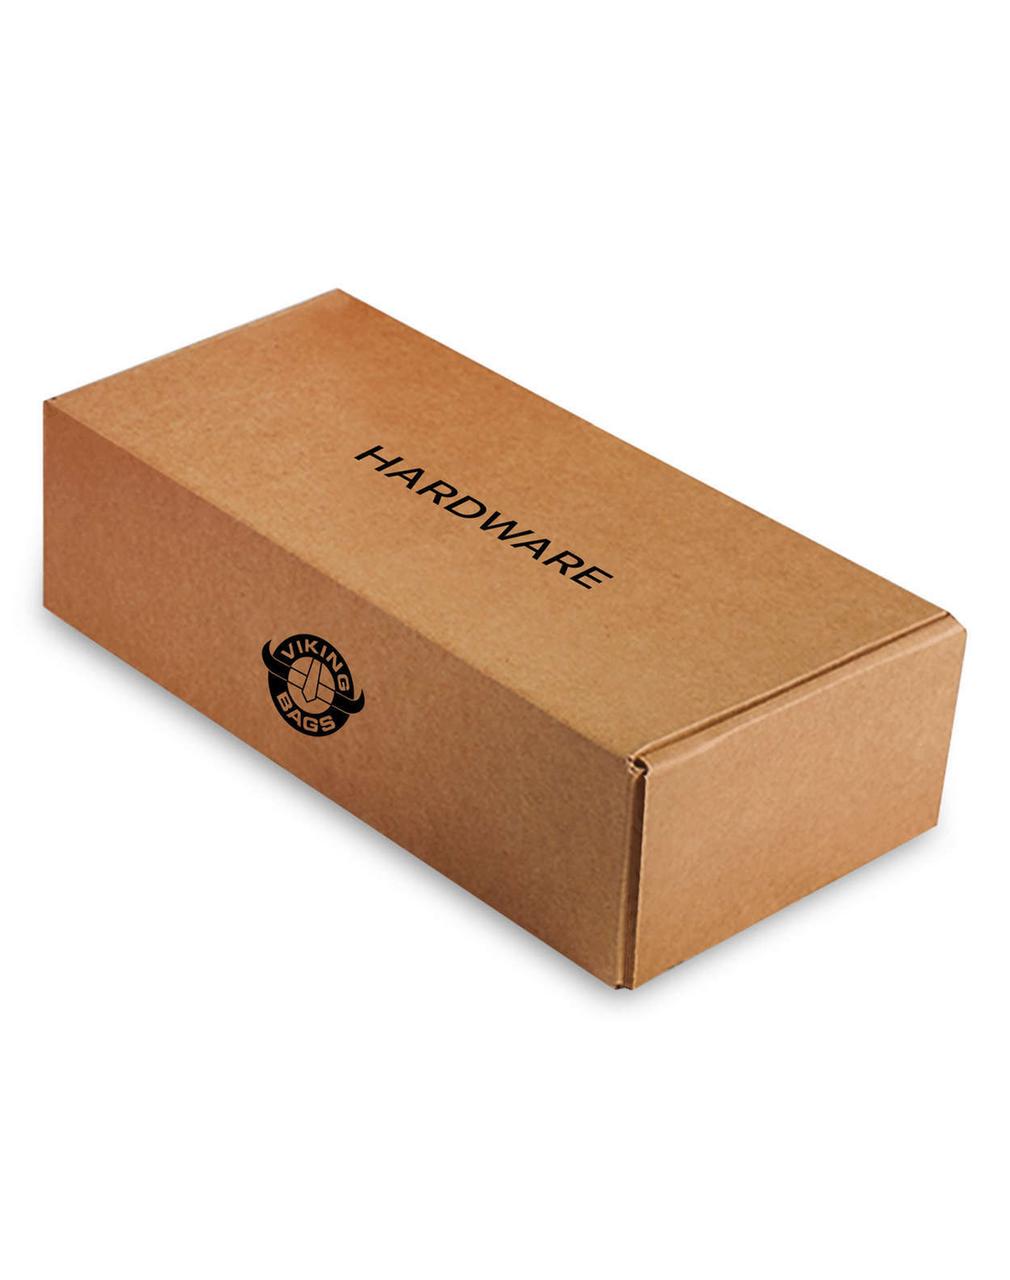 Triumph Thunderbird Viking Odin Brown Large Motorcycle Saddlebags Box